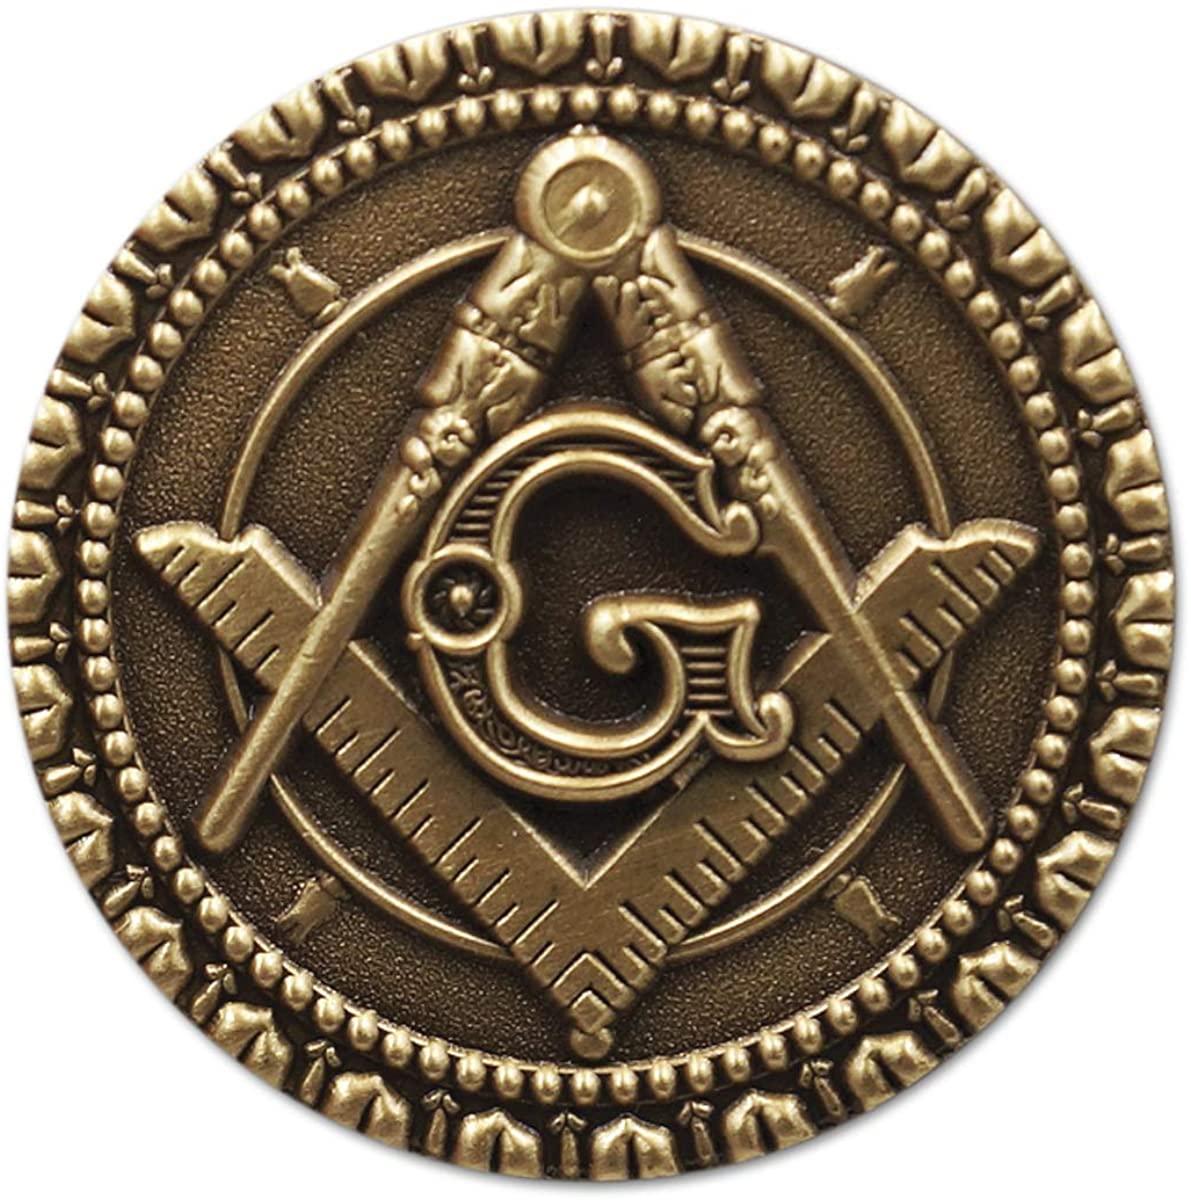 Square & Compass Round Masonic Lapel Pin - [Antique Brass Finish][1'' Diameter]